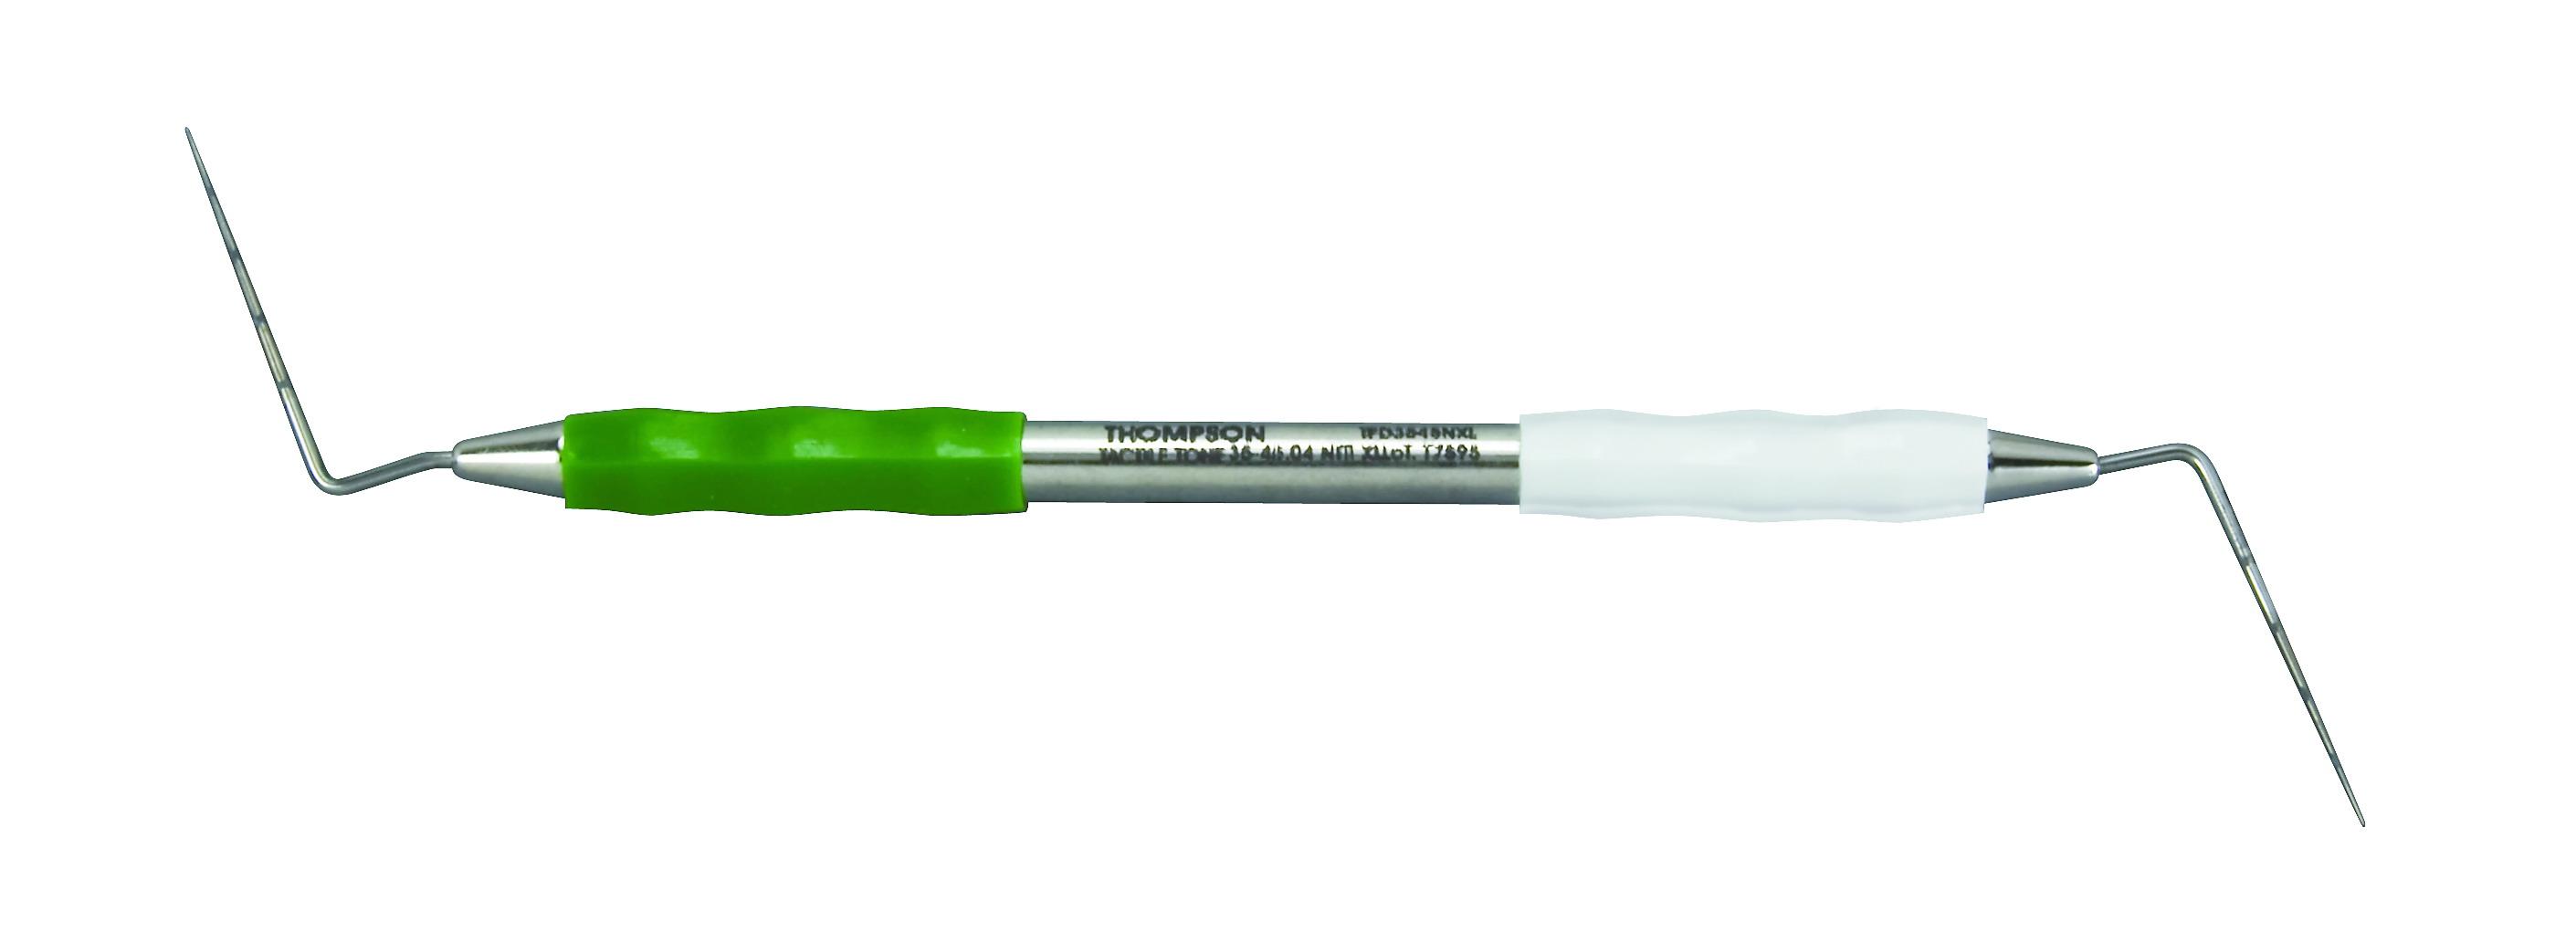 dovgan-plugger-04-iso-35-45-tactile-tone-double-end-niti-27-mmgreen-white-tfd3545nxl-miltex.jpg